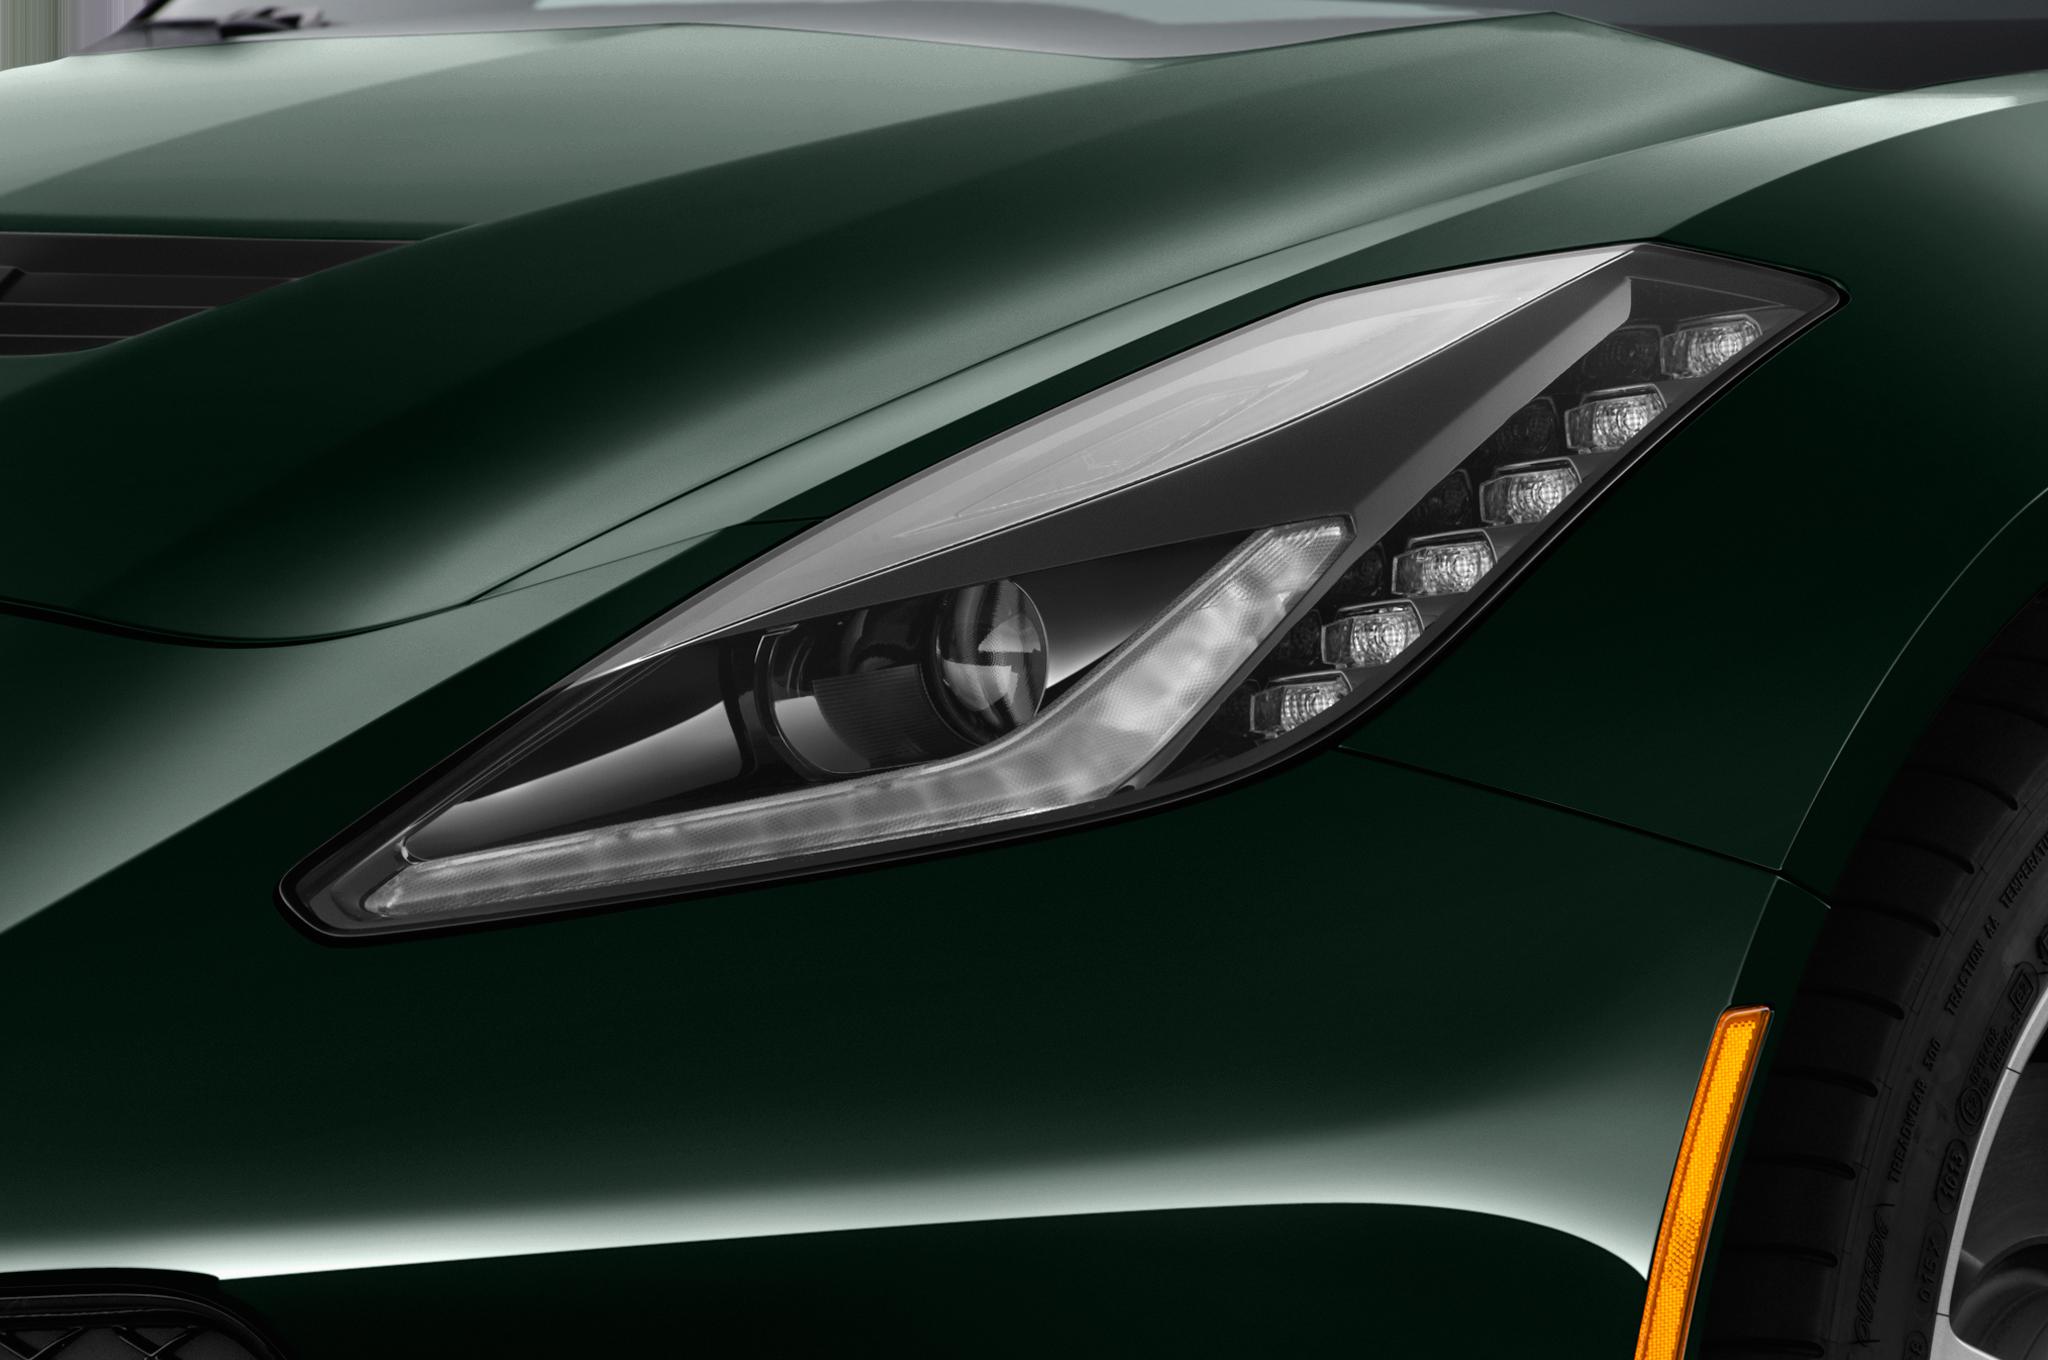 Jeff Gordons Chevrolet Corvette Z06 C7r Edition Up For Grabs 76 Camaro Wiring Diagram 42 97